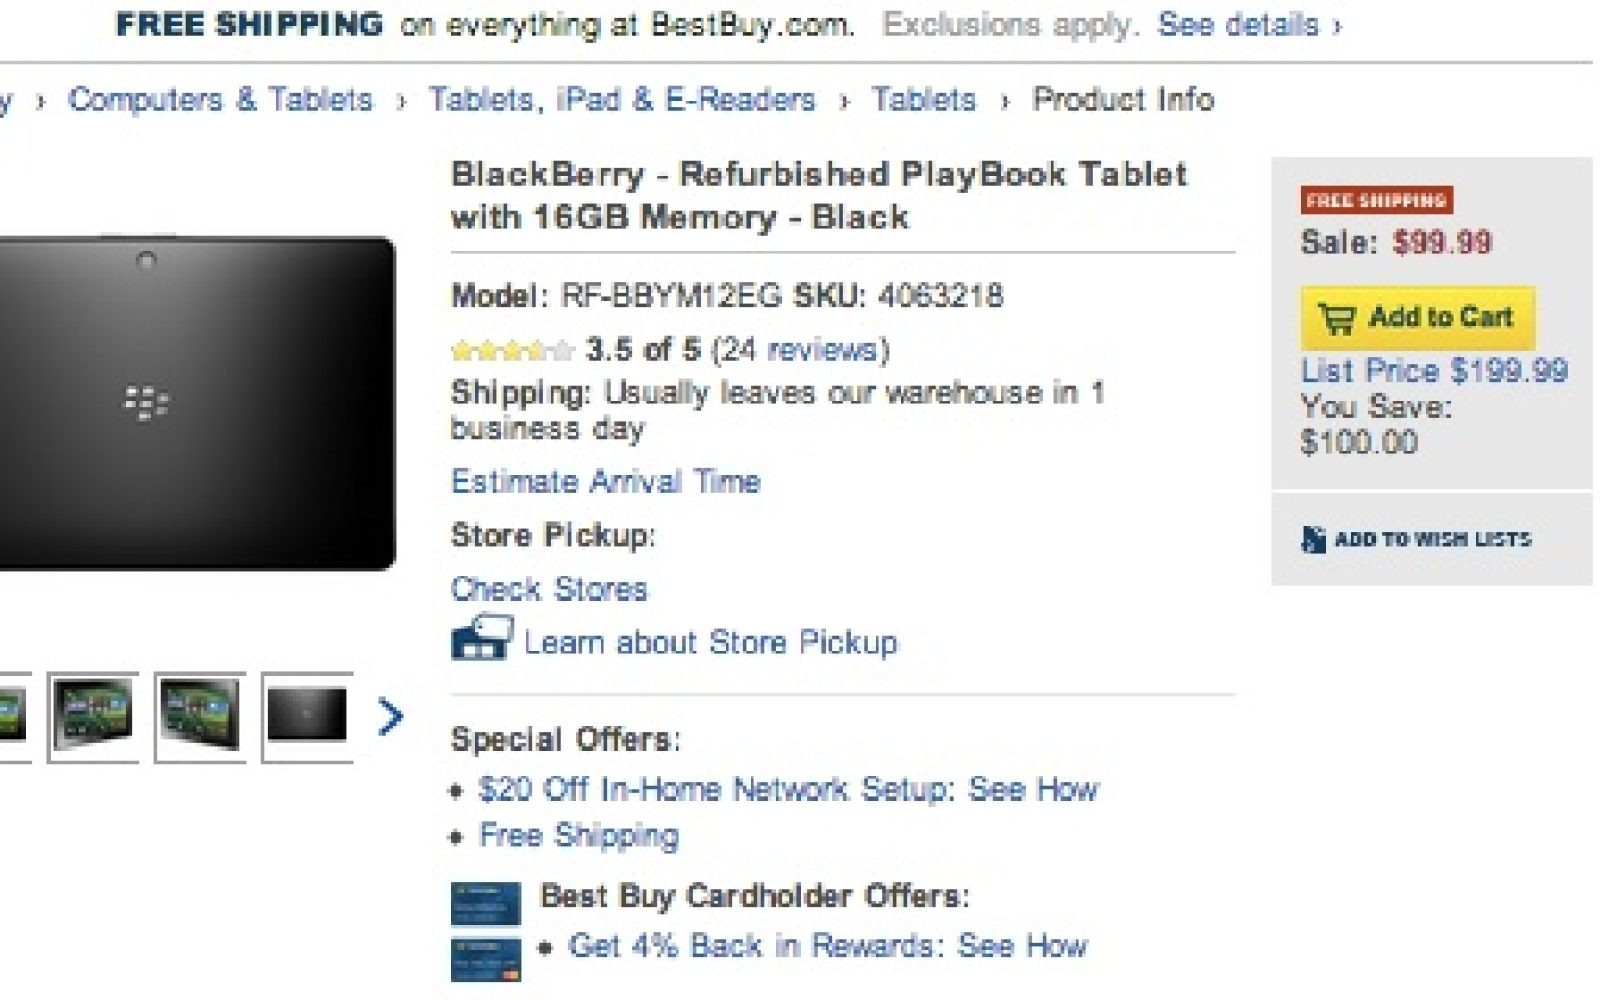 BlackBerry - Refurbished PlayBook Tablet with 16GB Memory